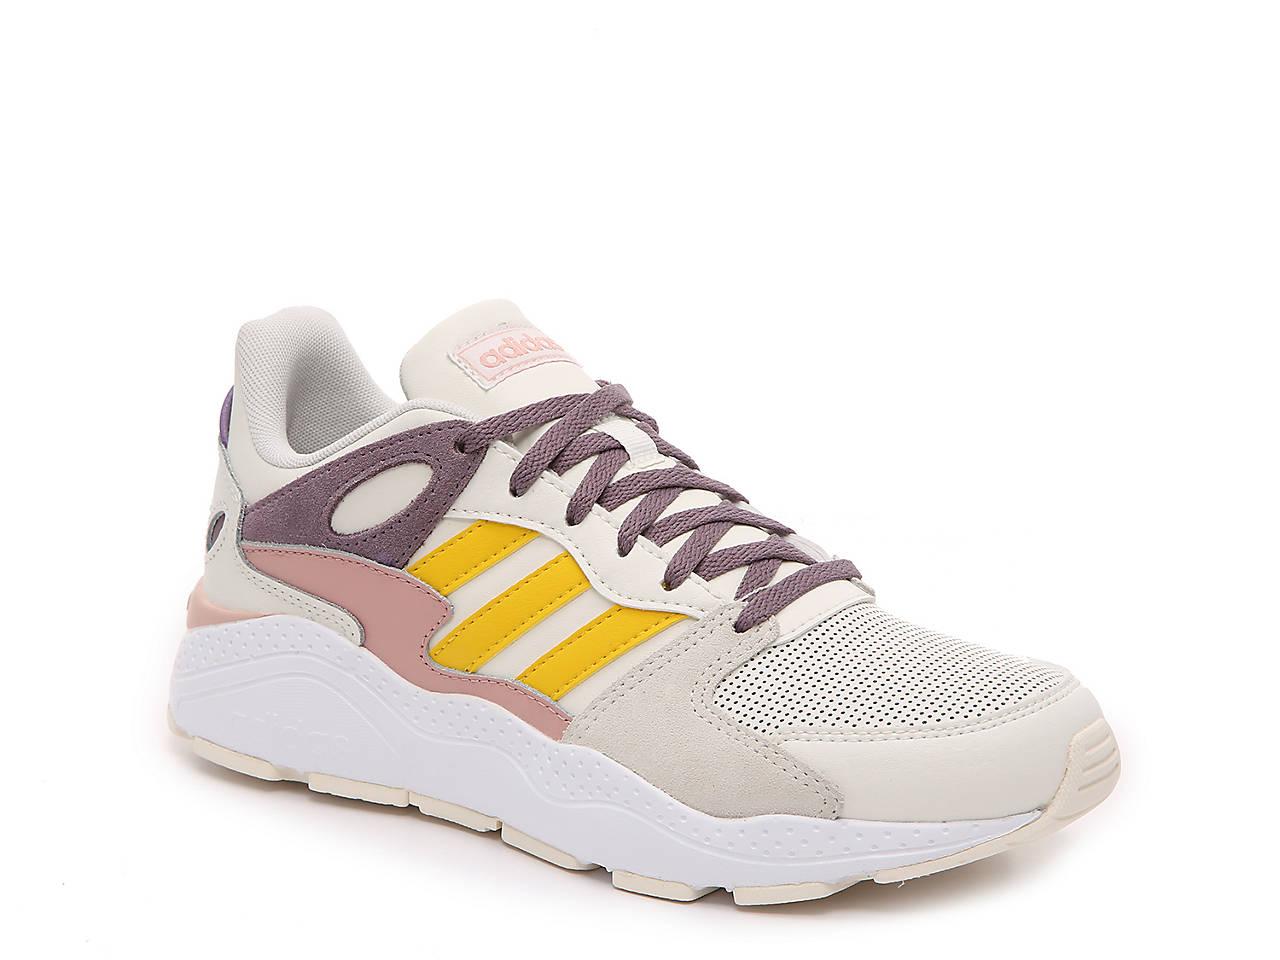 adidas Chaos Sneaker Women's Women's Shoes | DSW